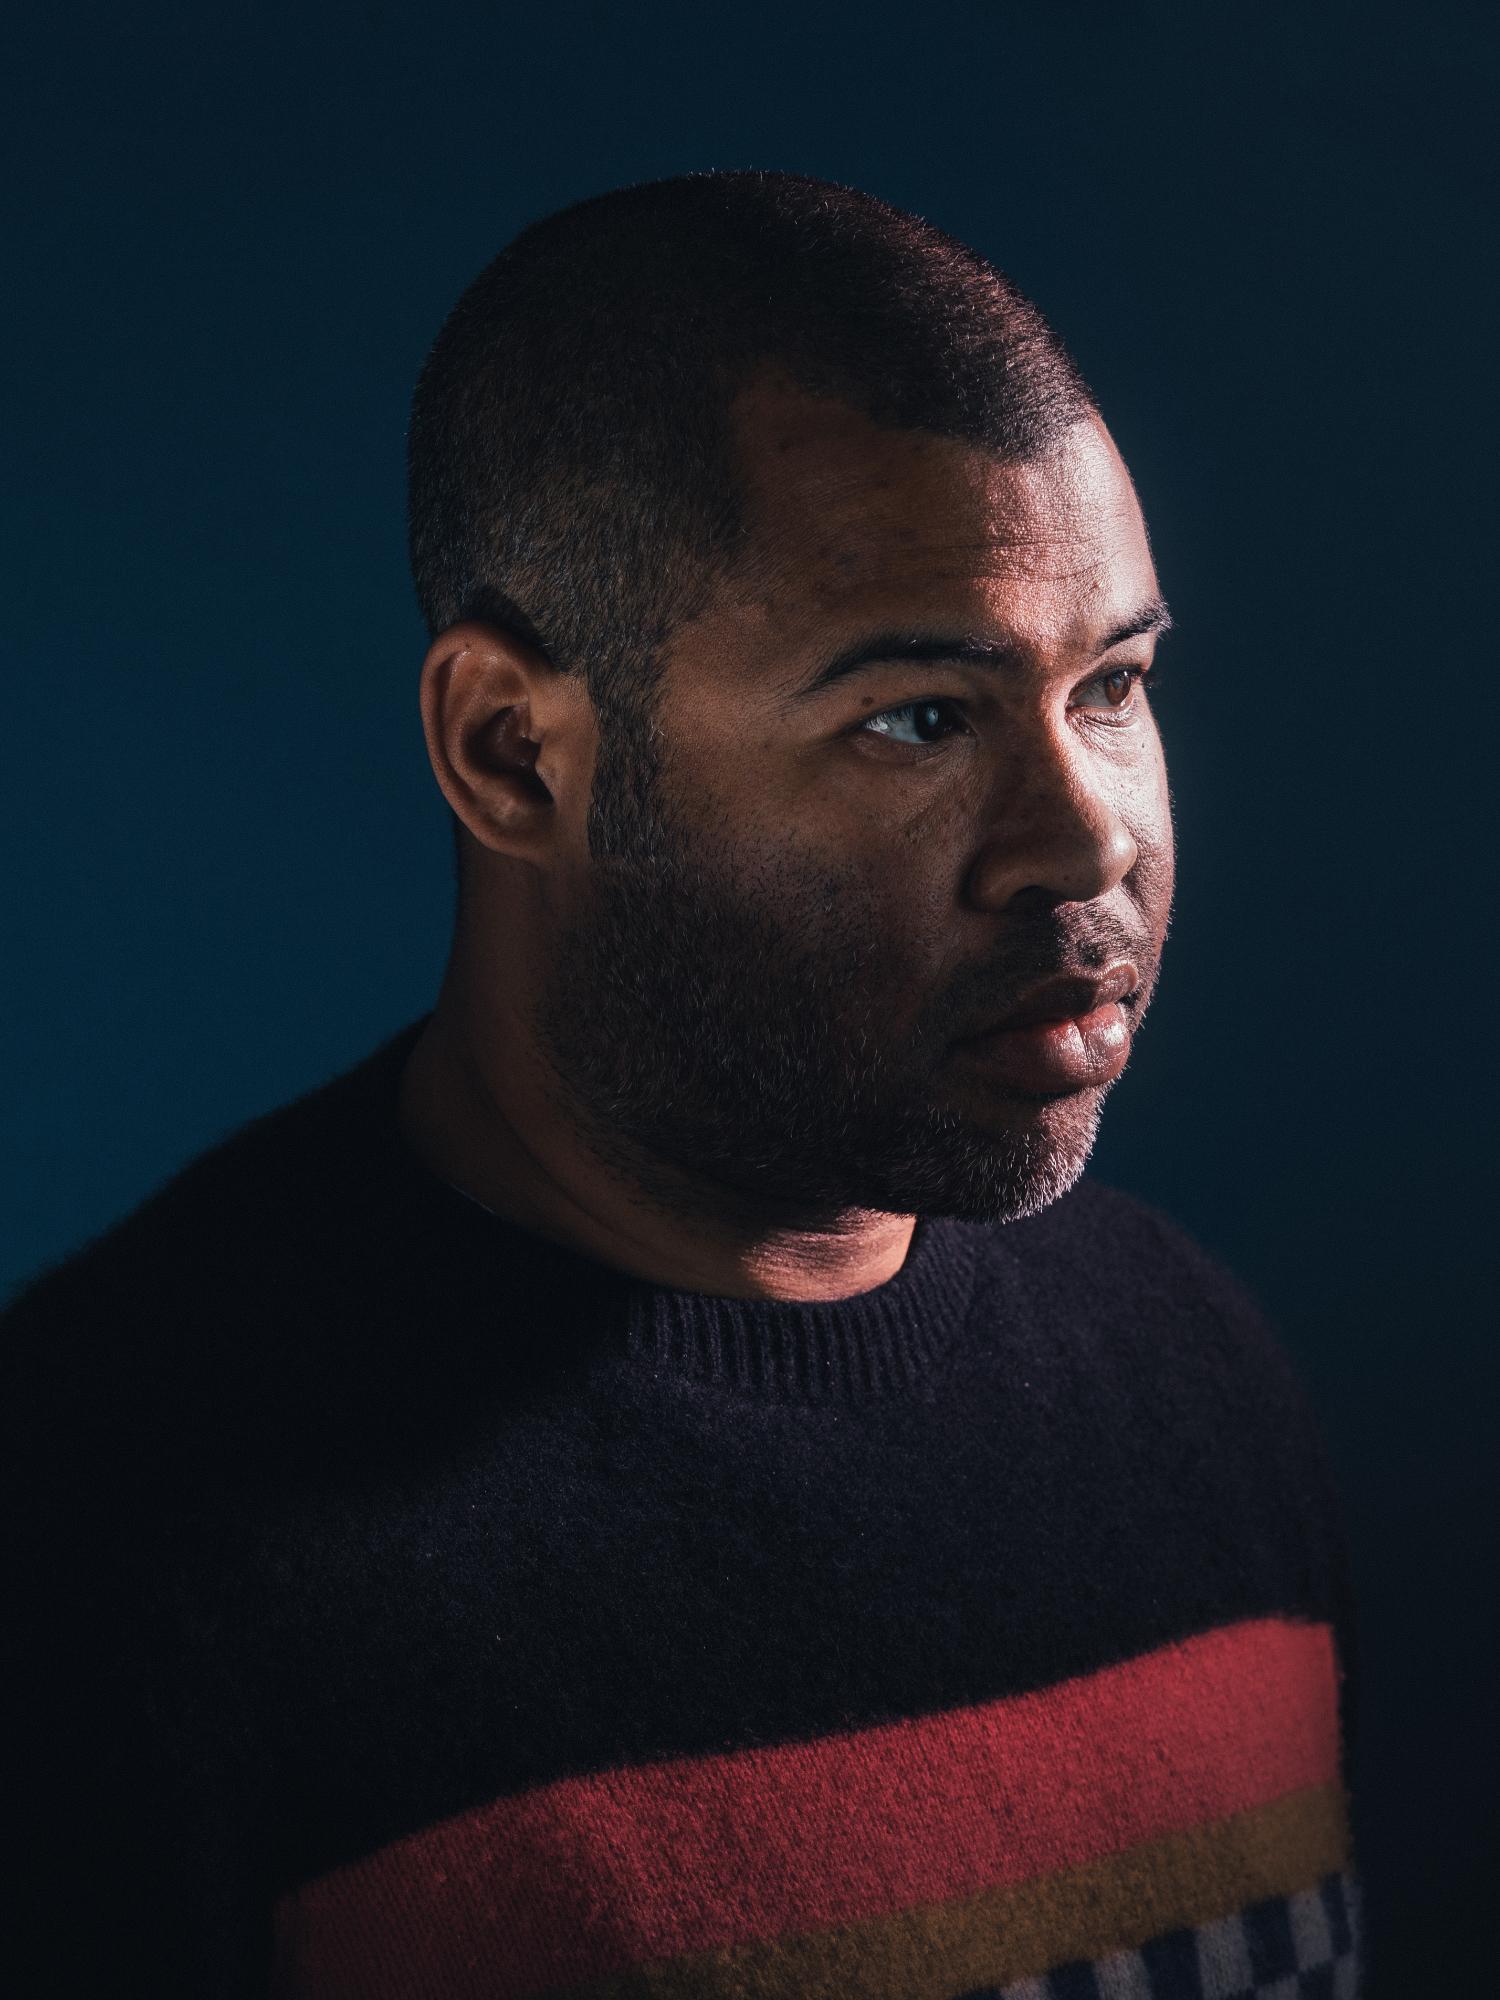 Jordan Peele for The New York Times